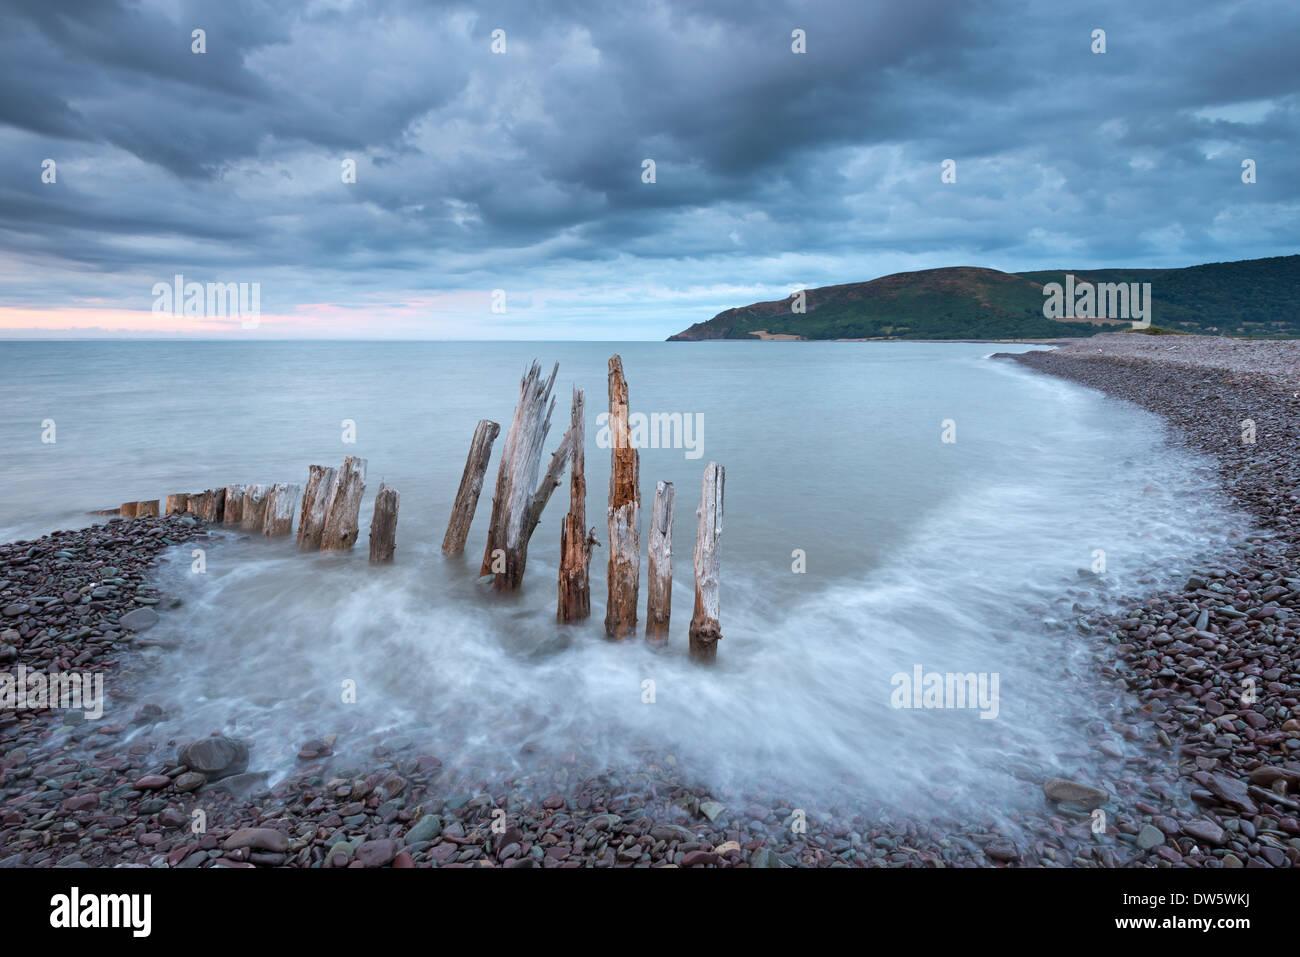 Wooden sea defences at Bossington Beach, Exmoor, Somerset, England. Summer (July) 2013. - Stock Image